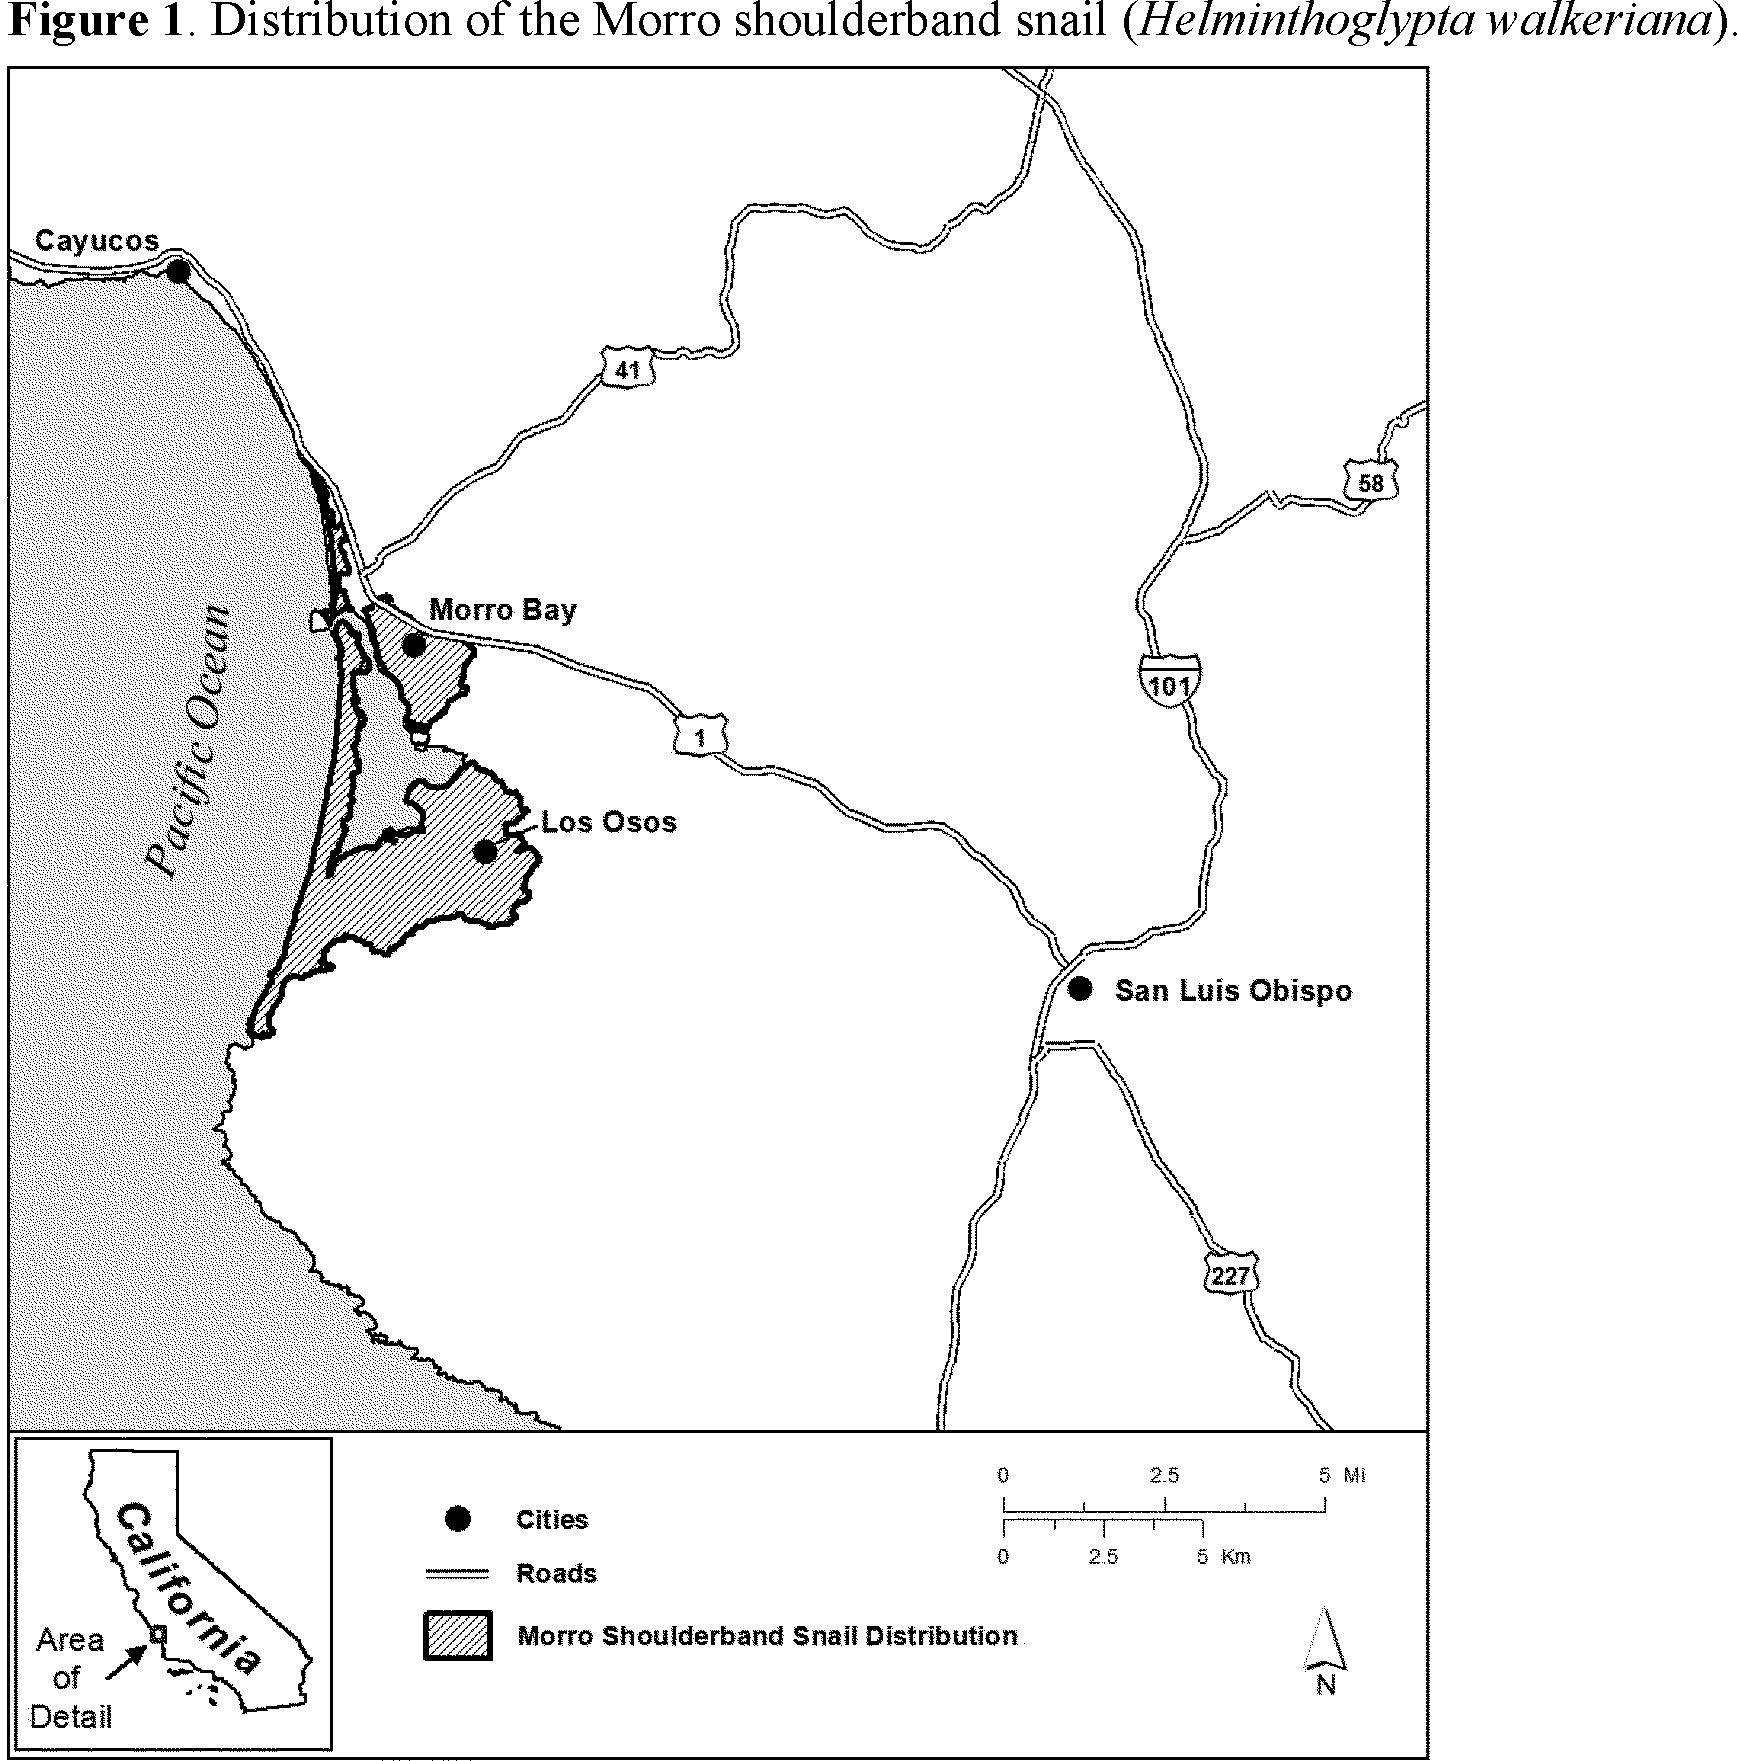 helminthoglypta walkeriana